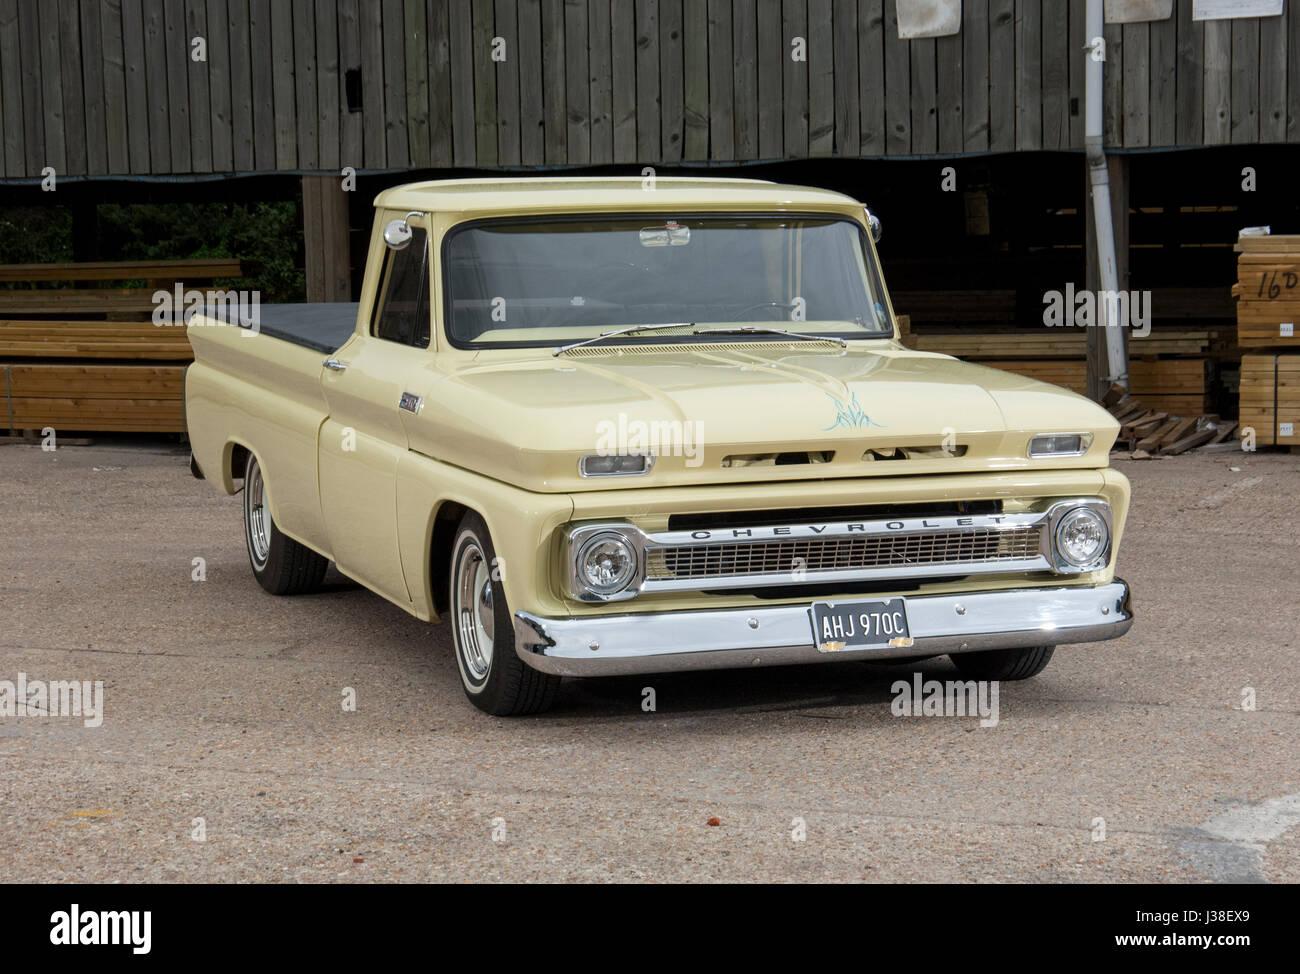 1966 Chevrolet C10 classic pick up truck Stock Photo: 139714241 - Alamy